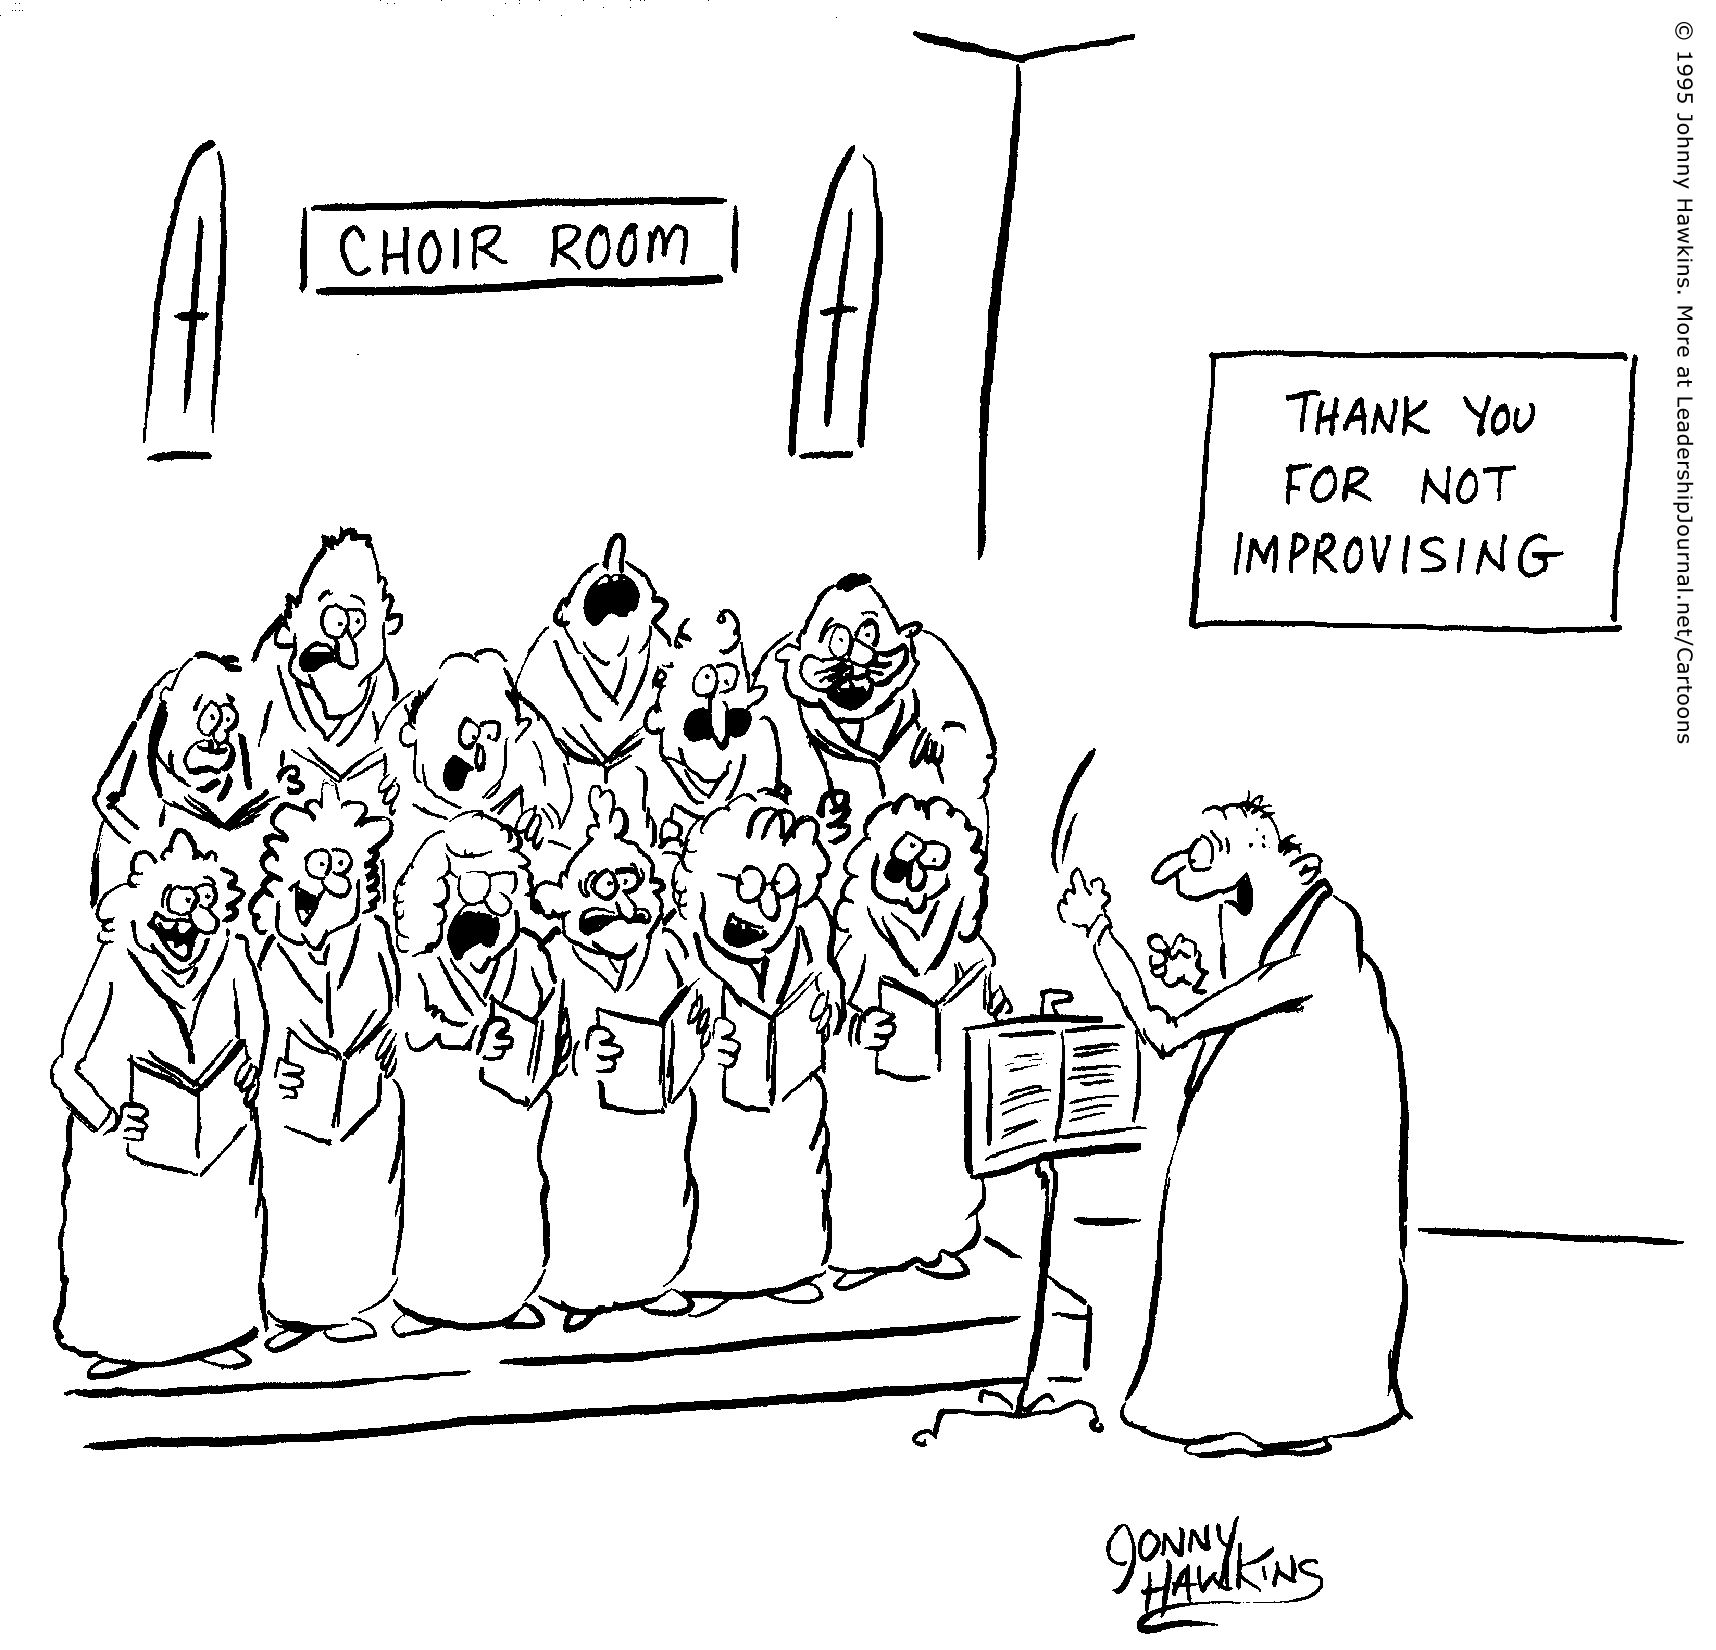 Improvising Forbidden In Choir